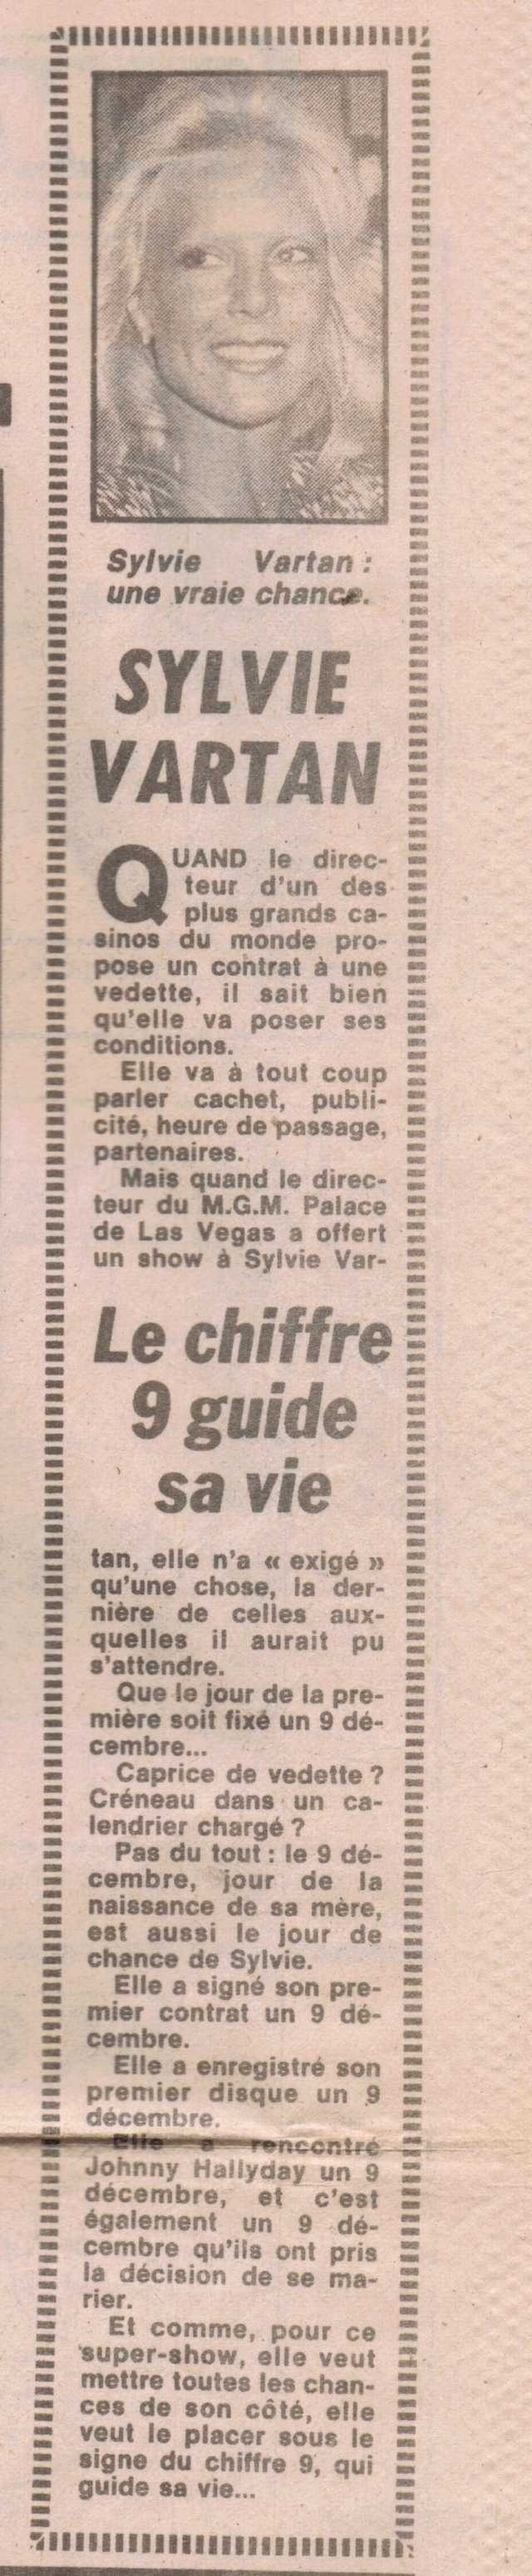 Discographie N° 81 MARATHON WOMAN - Page 2 France43